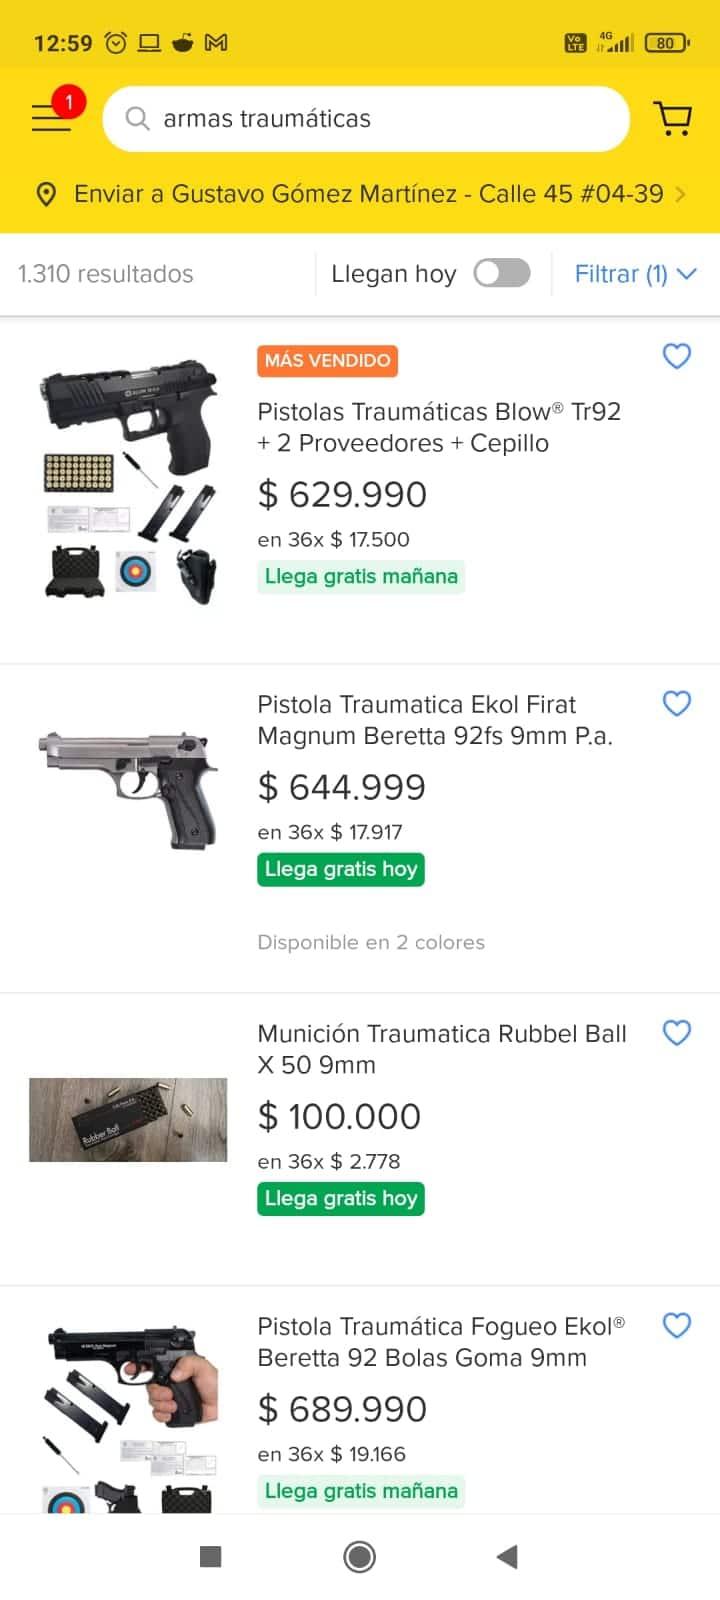 Armas traumáticas por Mercado Libre